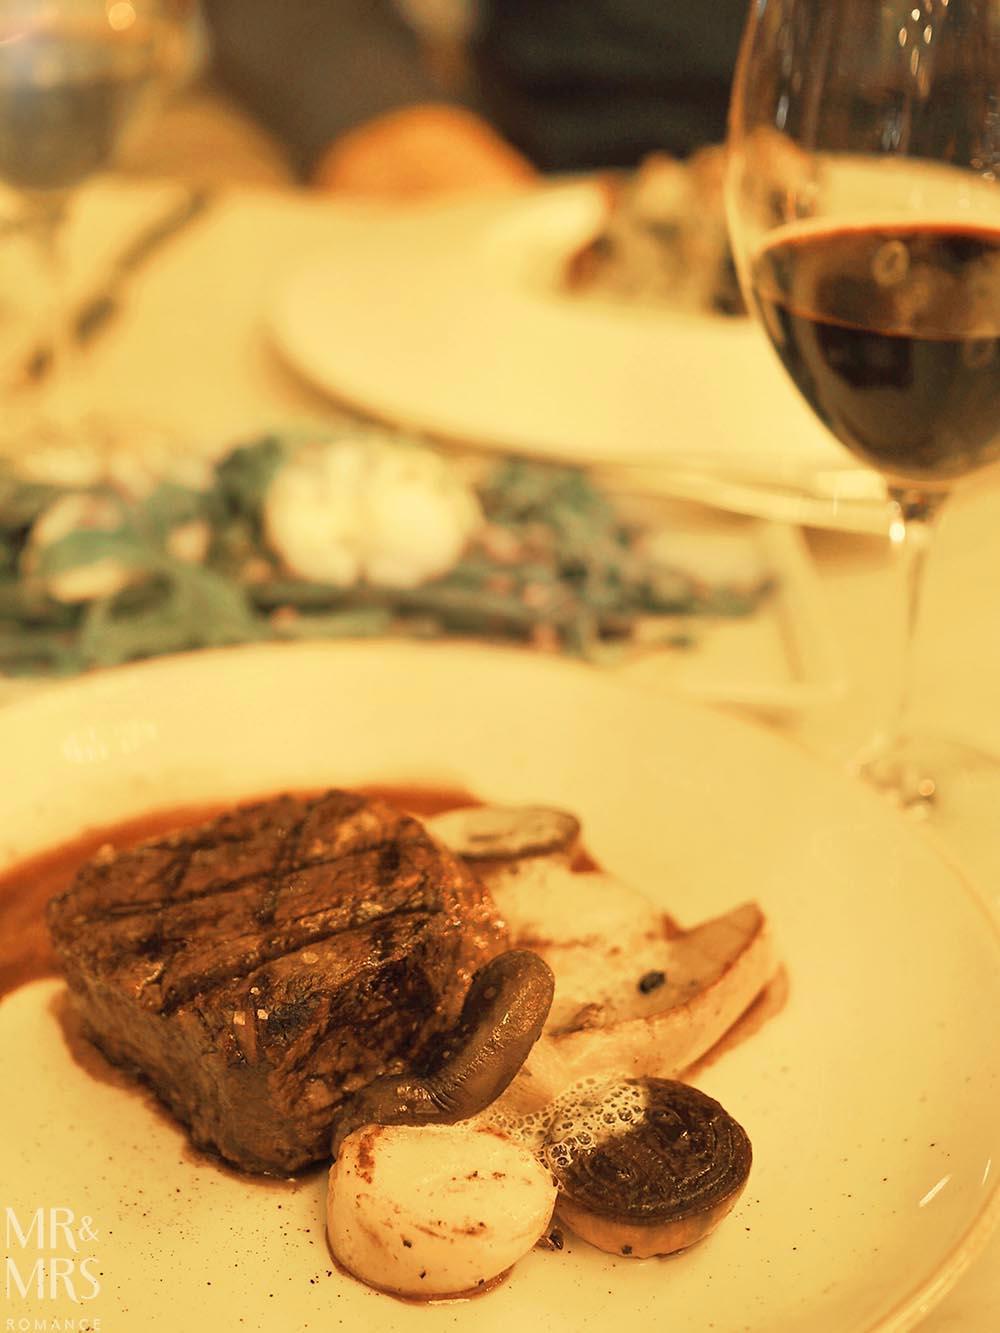 Q Dining - 52 degree King Island tenderloin of beef